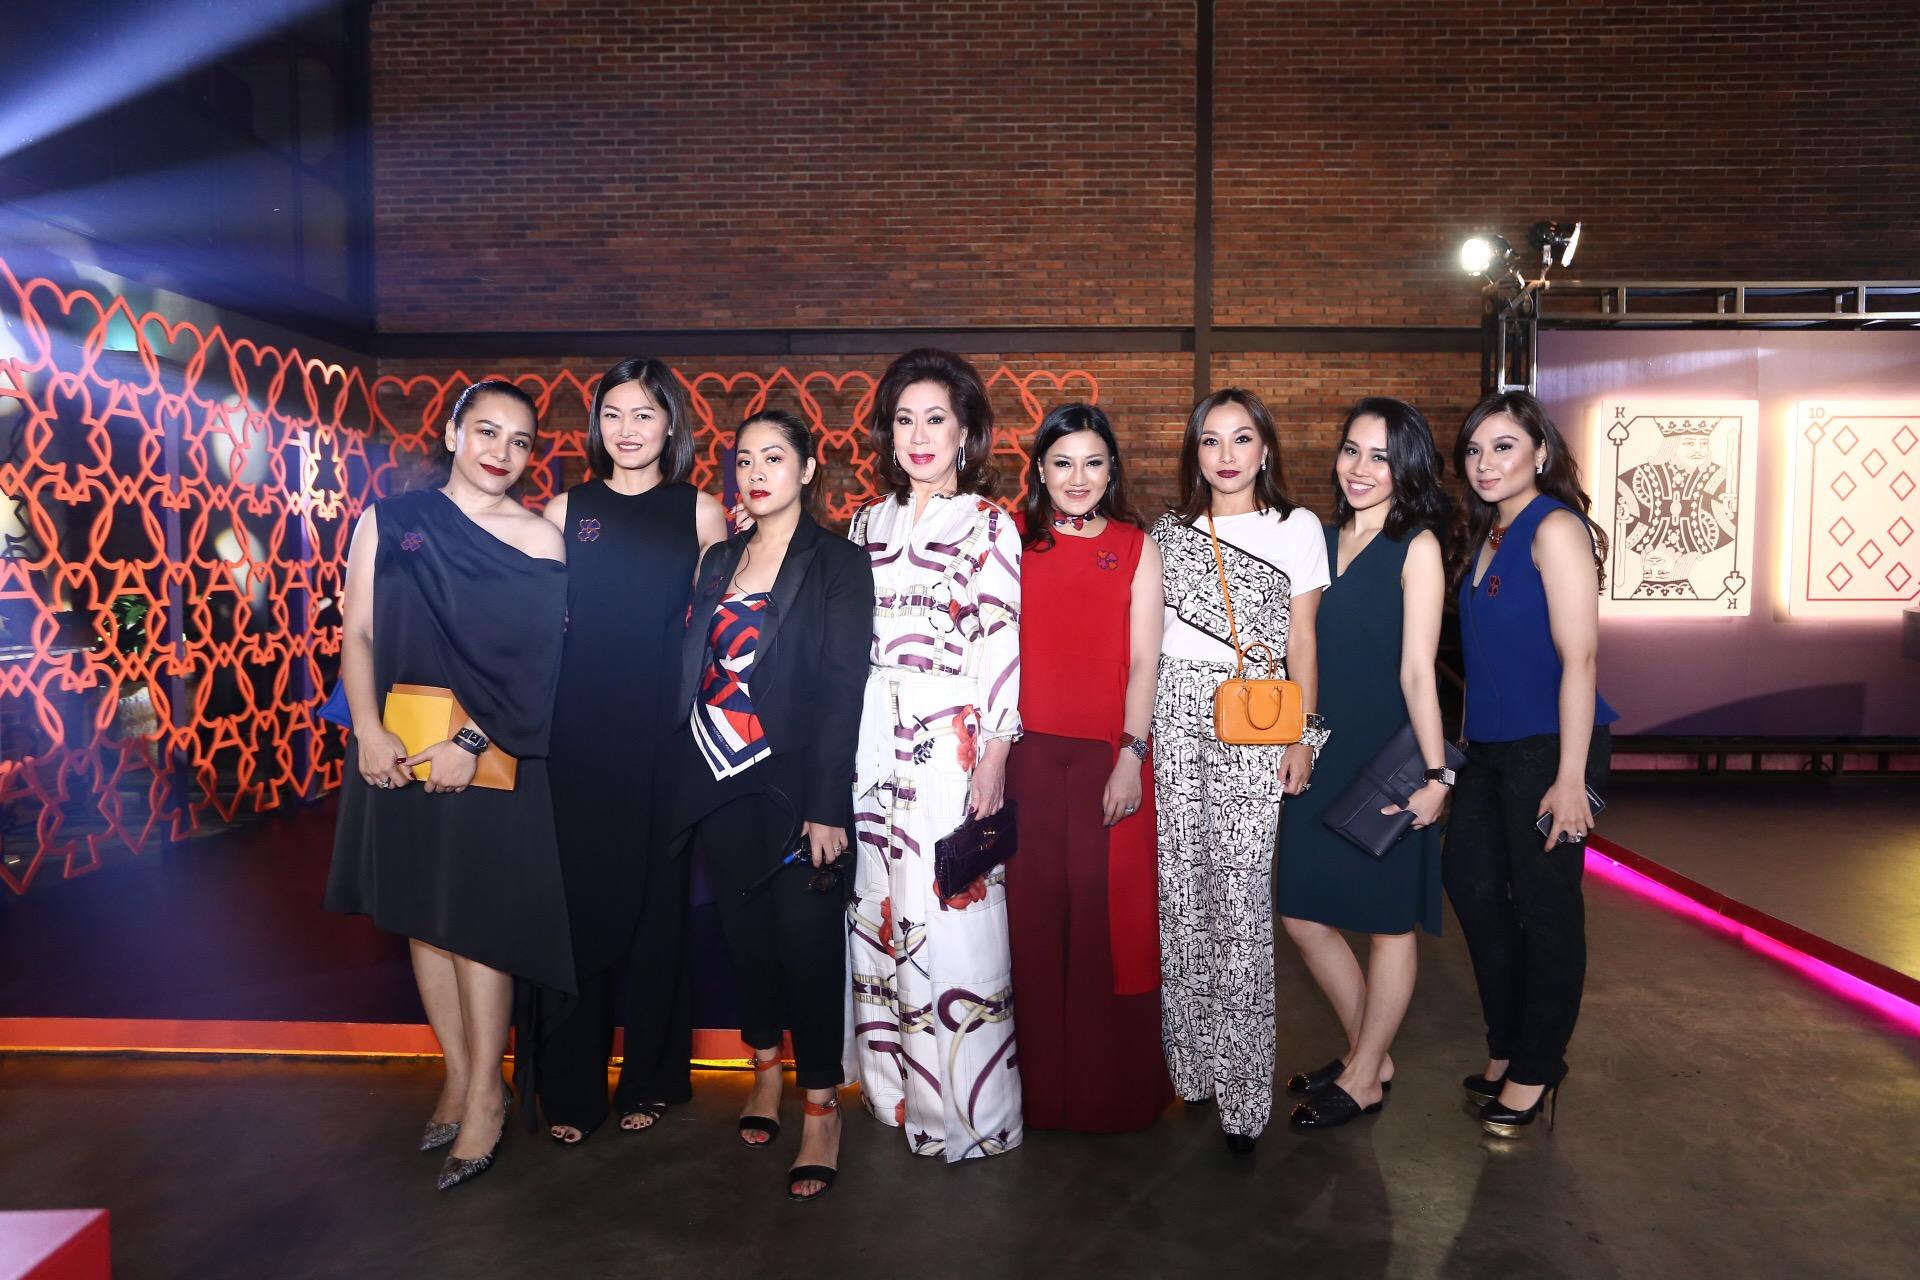 #HermèsLetsPlay at León!